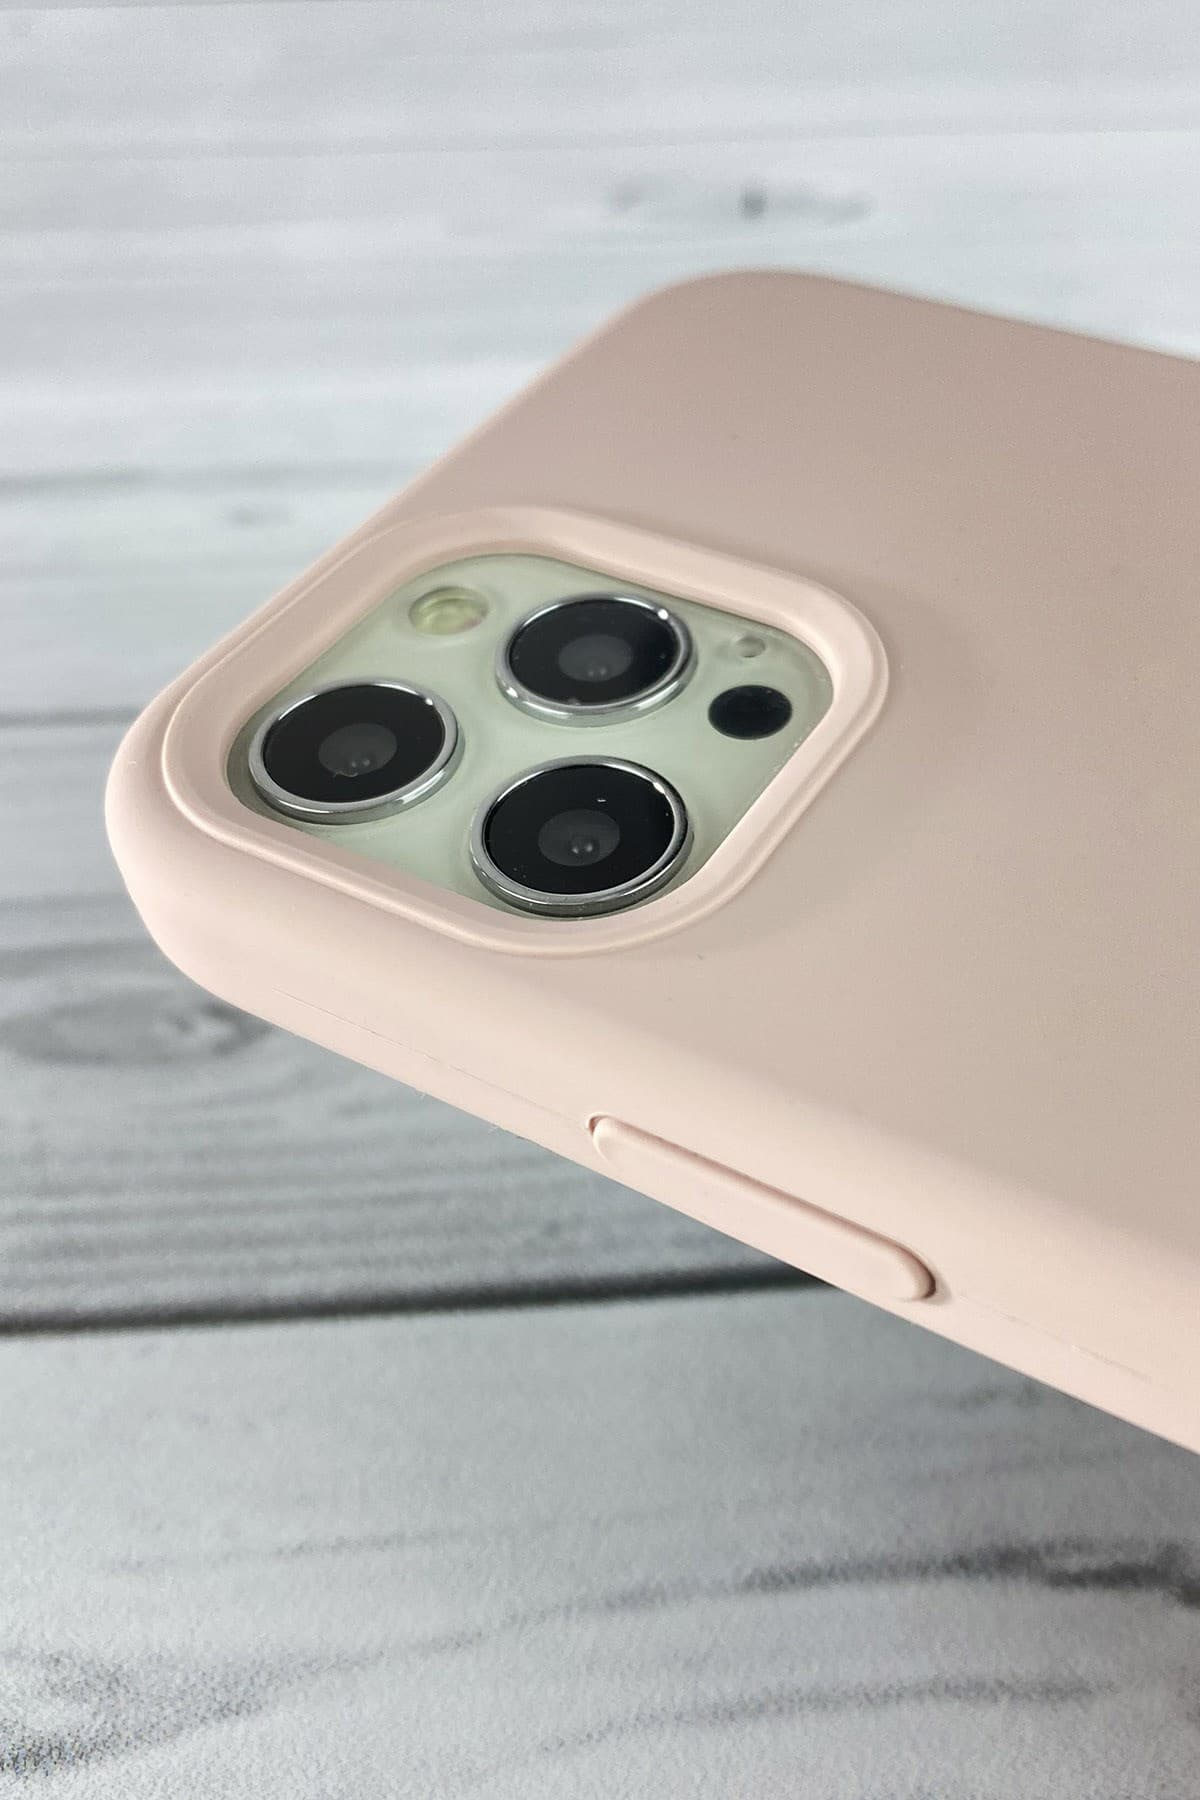 Iphone Toz Pembe Lansman Kılıf 12 Promax